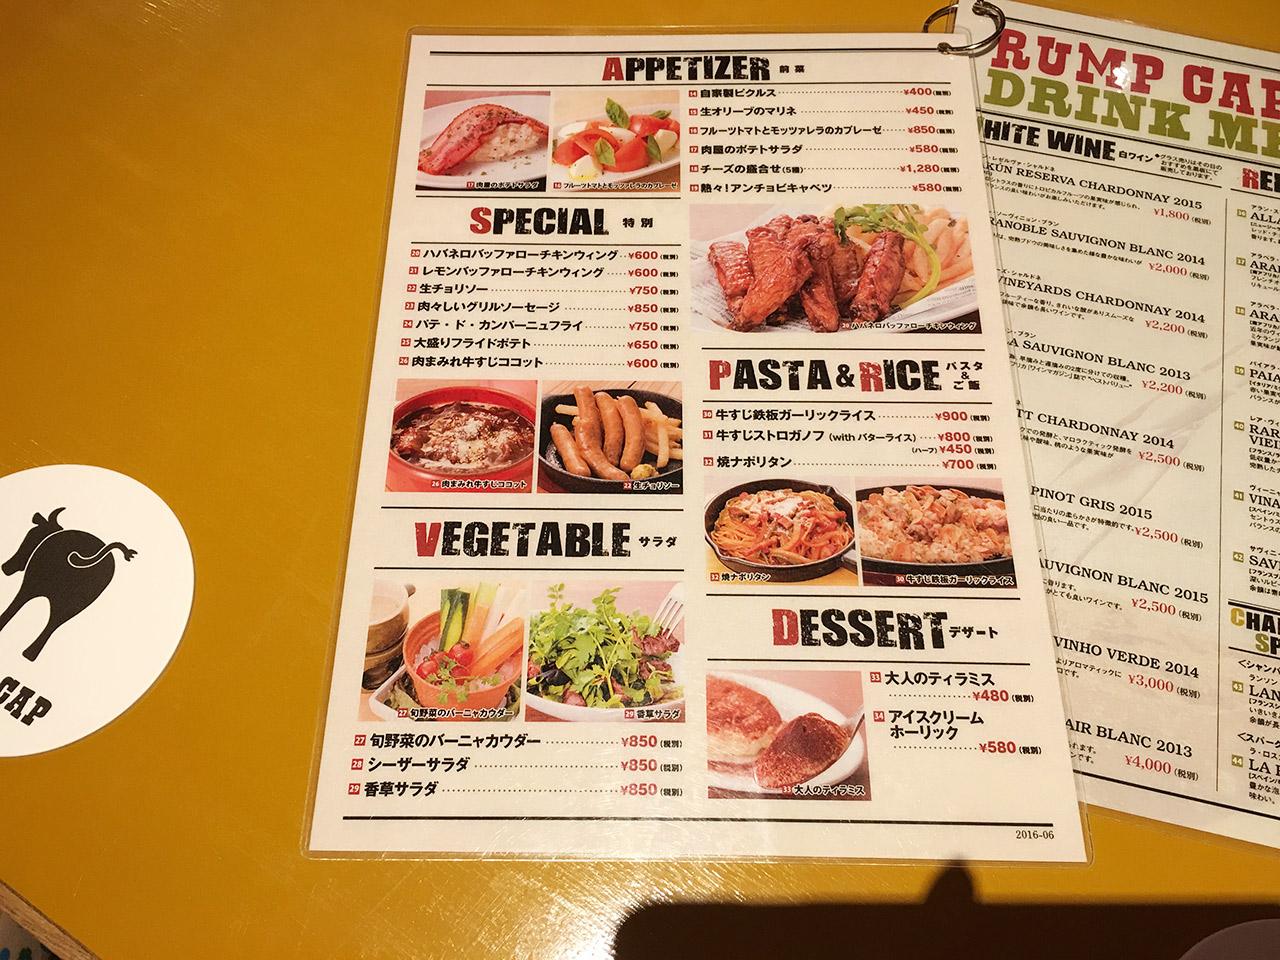 tachikawa-shokuniku-yokocho-rumpcap-menu02